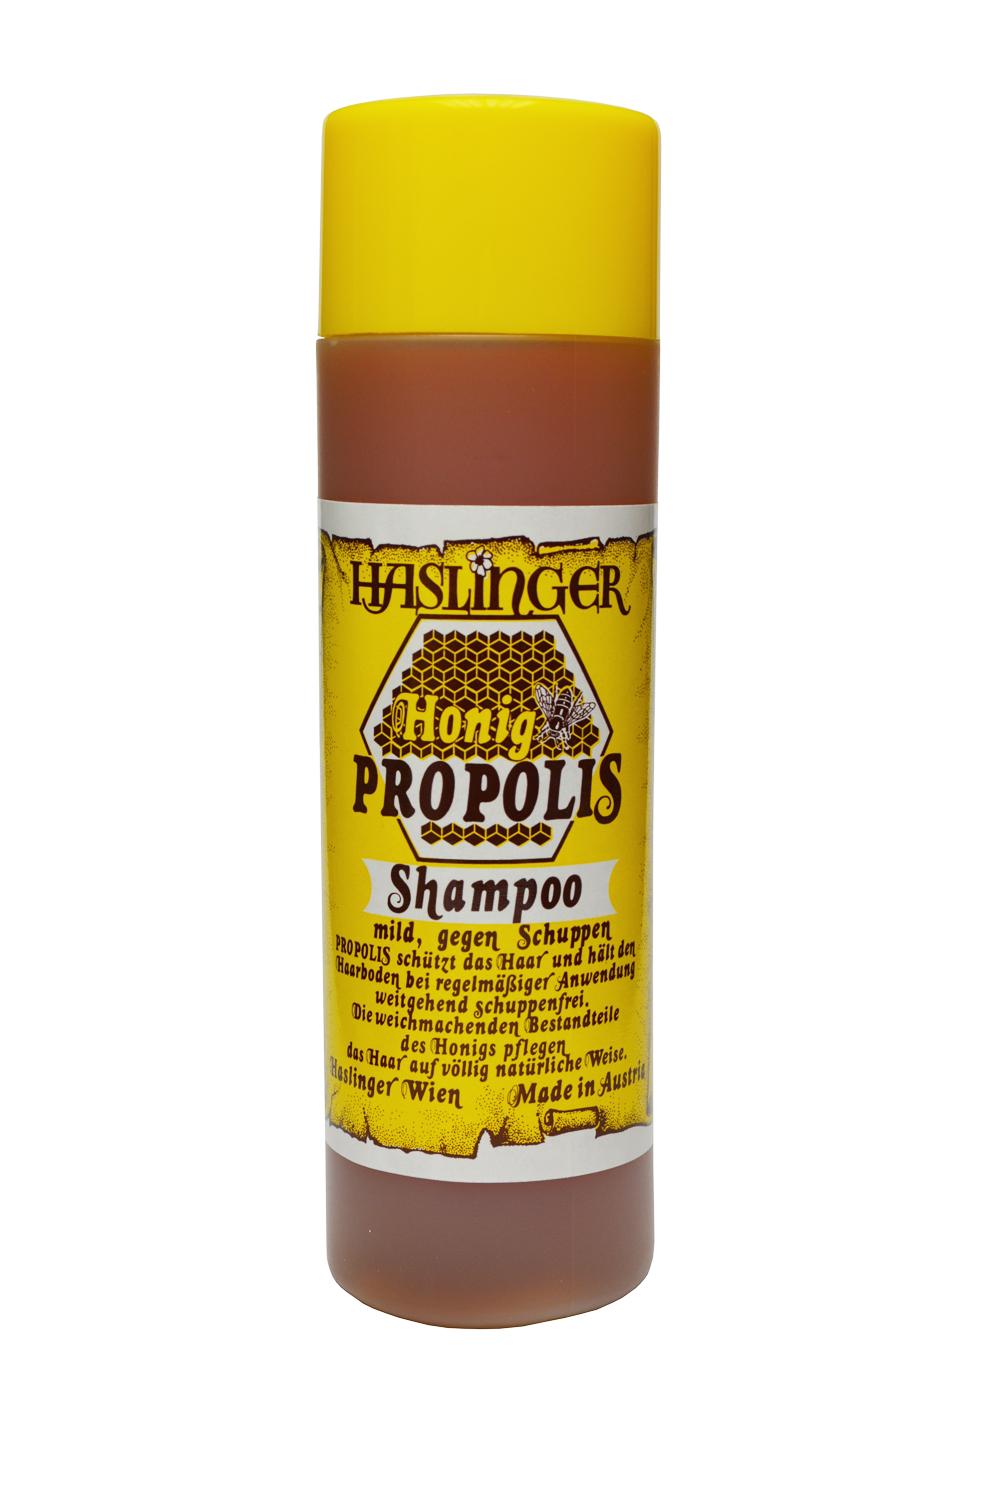 Haslinger Honig Propolis Shampoo